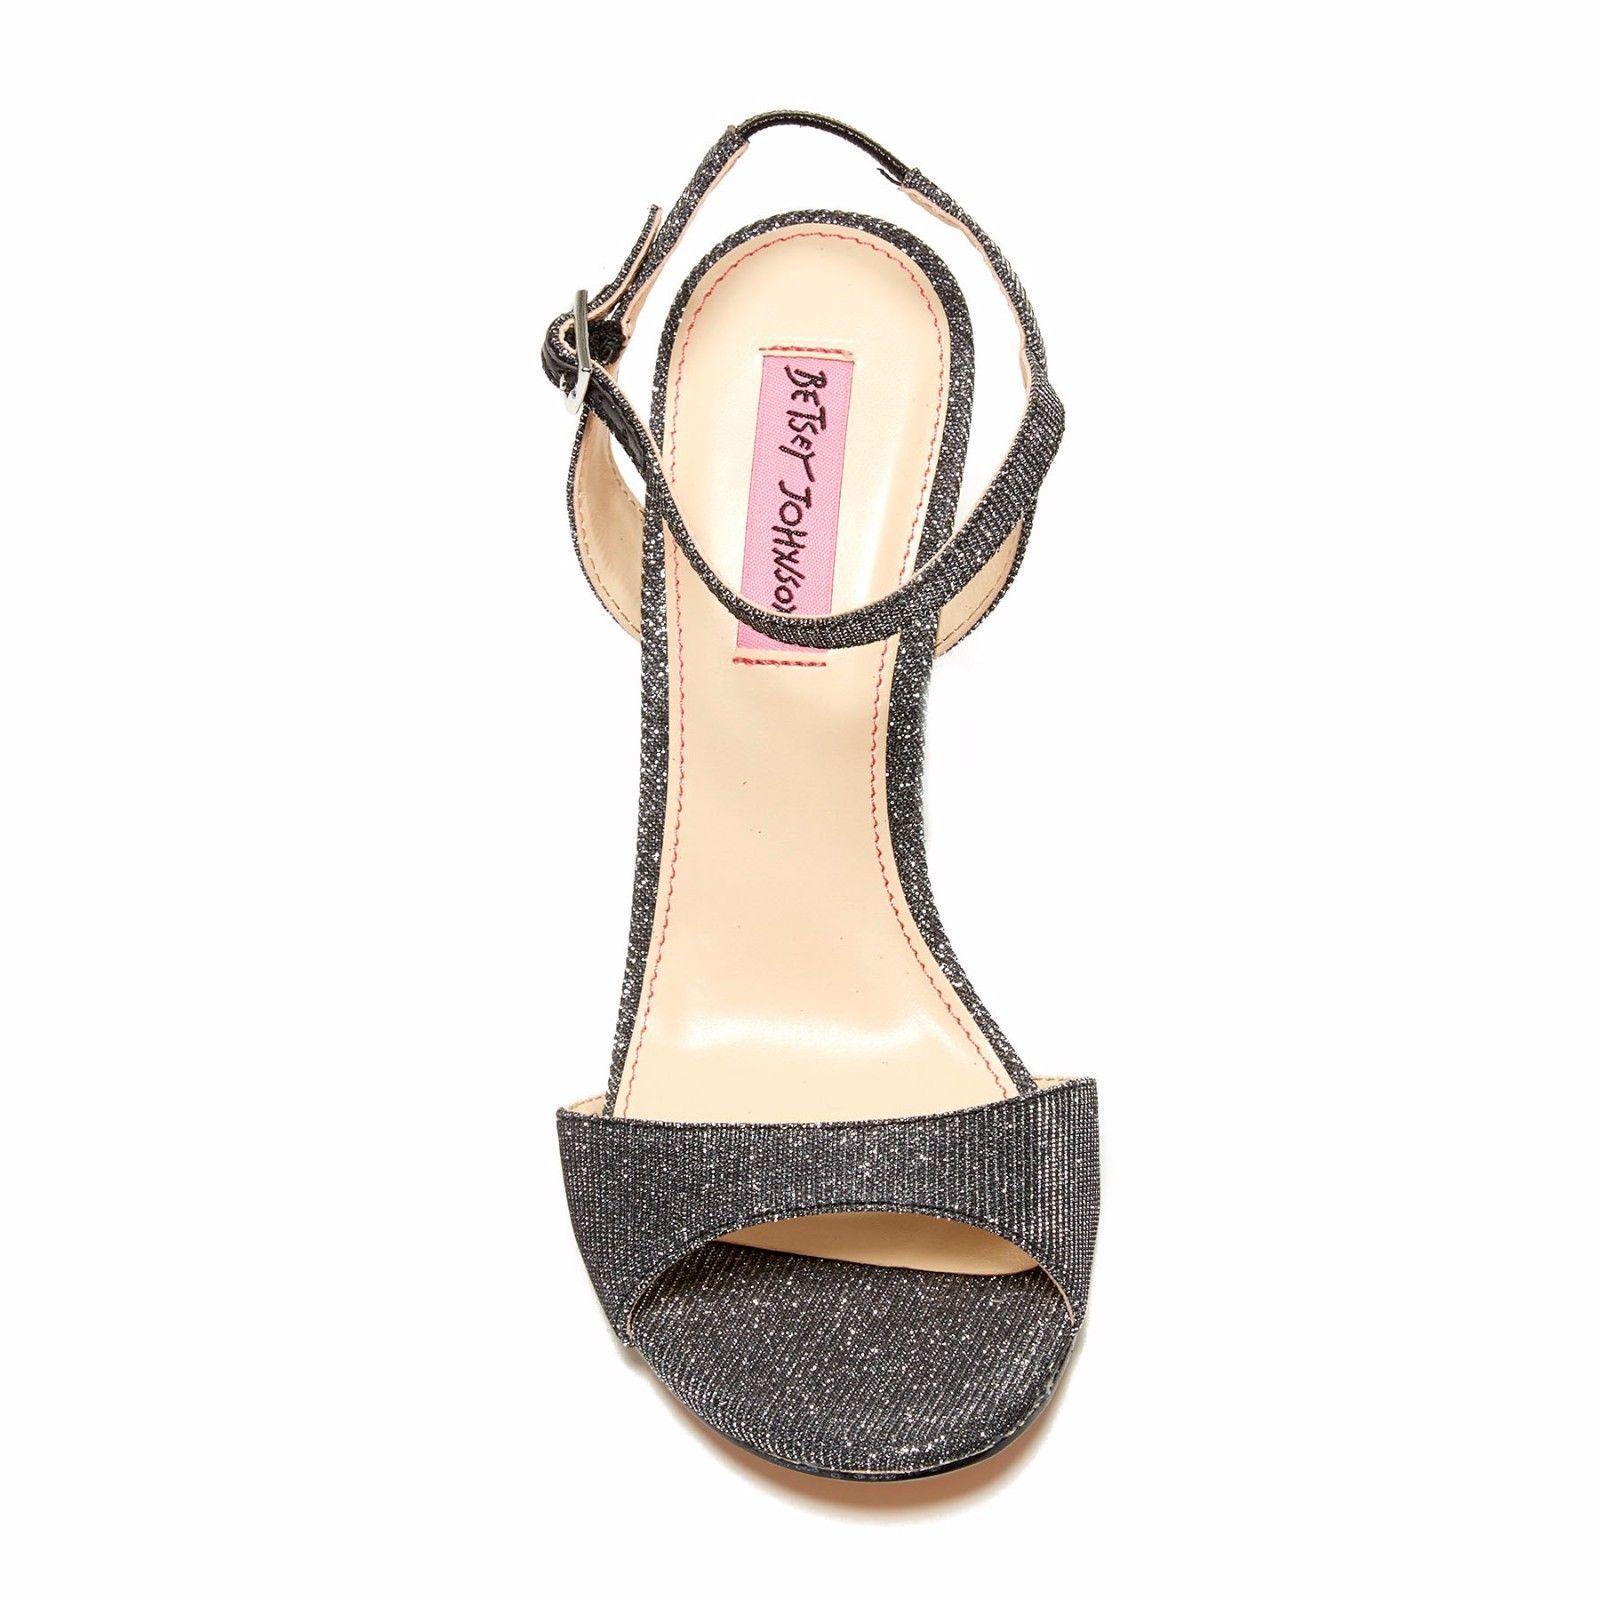 Betsey Johnson Duane Metallic Glitter Fabric Open Toe Platform Wedge Heels 8